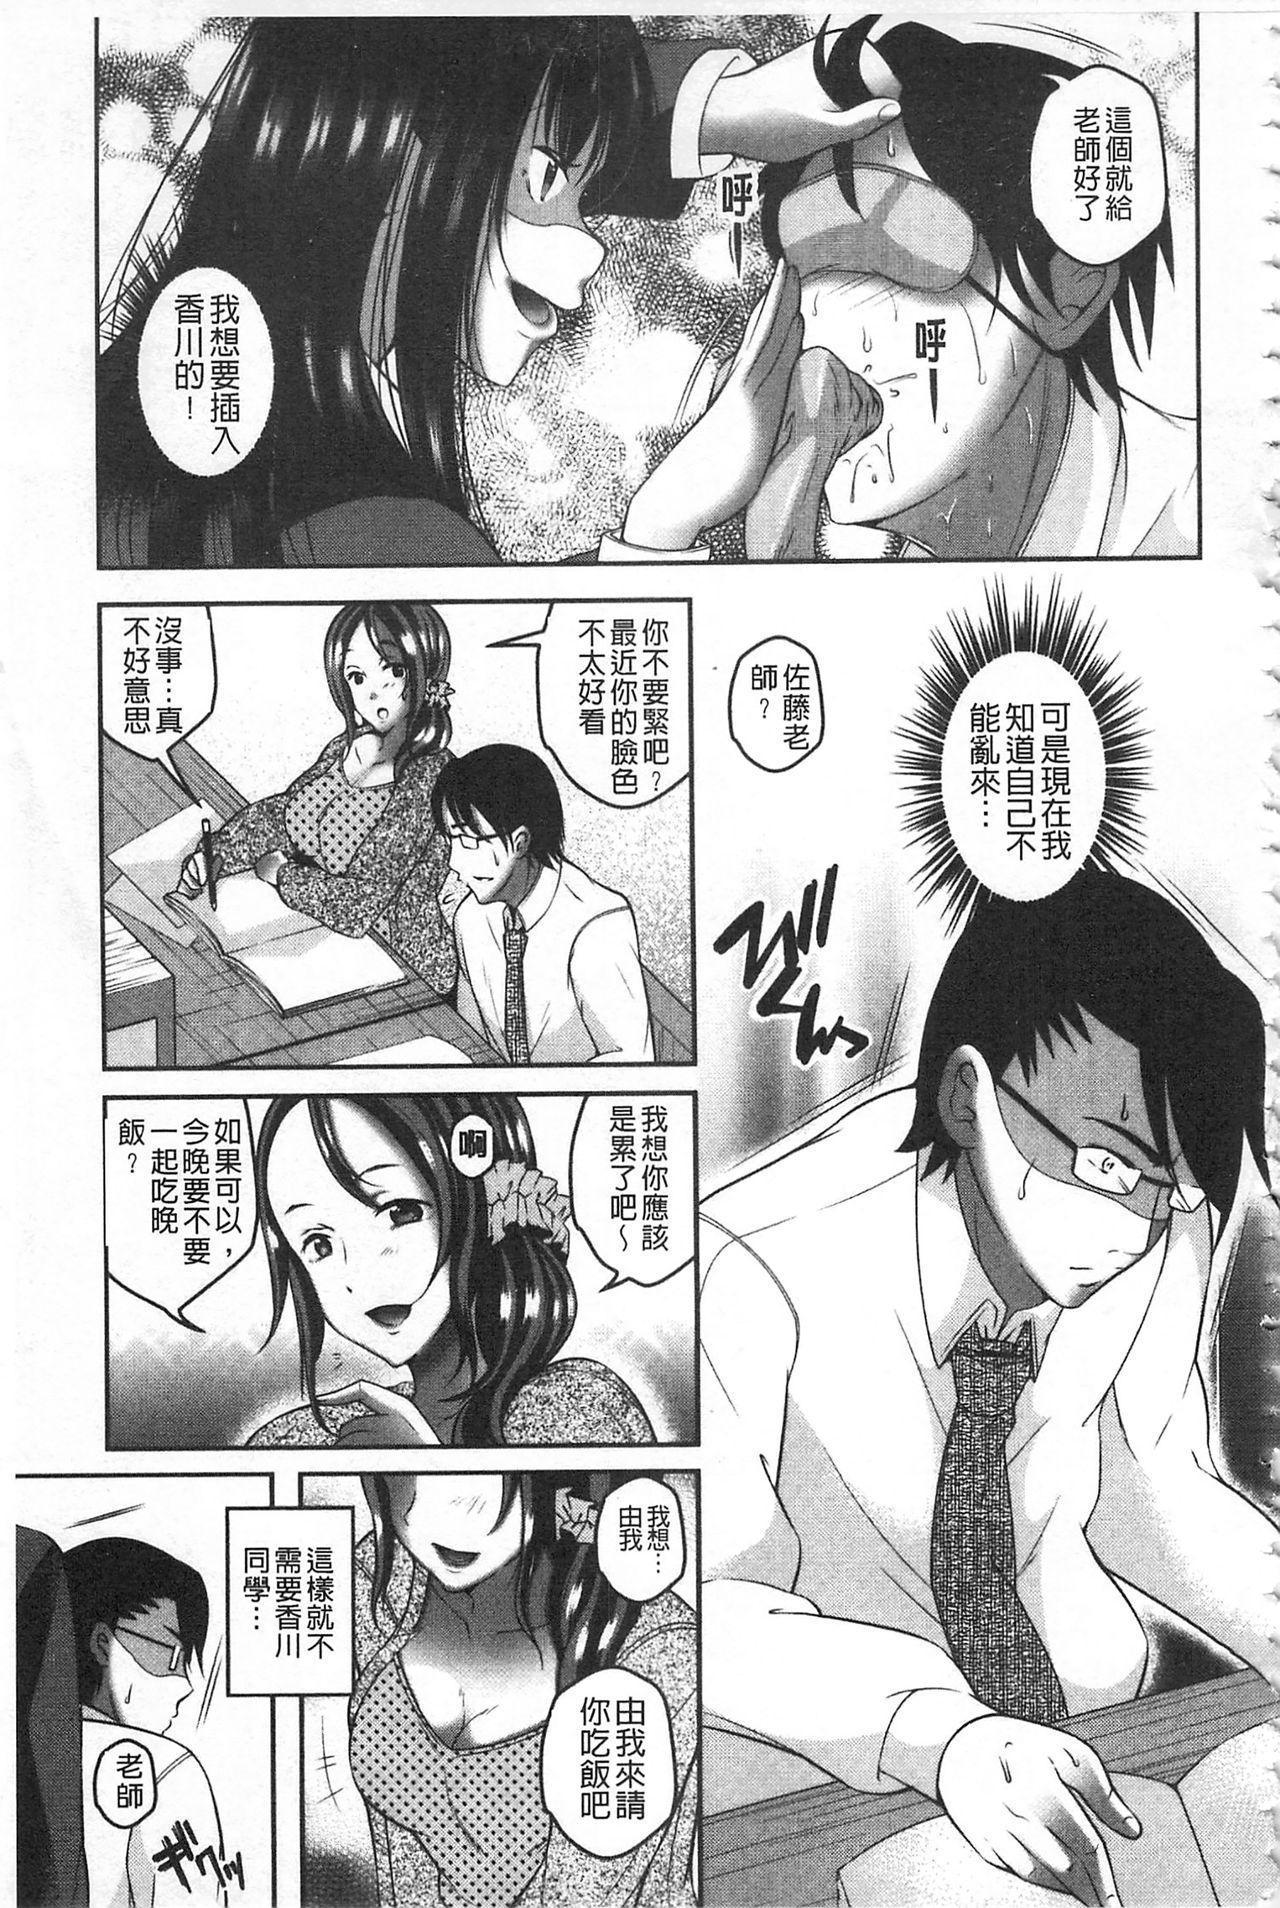 Kanjuku Otome no Odoshikata | 姦熟乙女的脅迫法 172